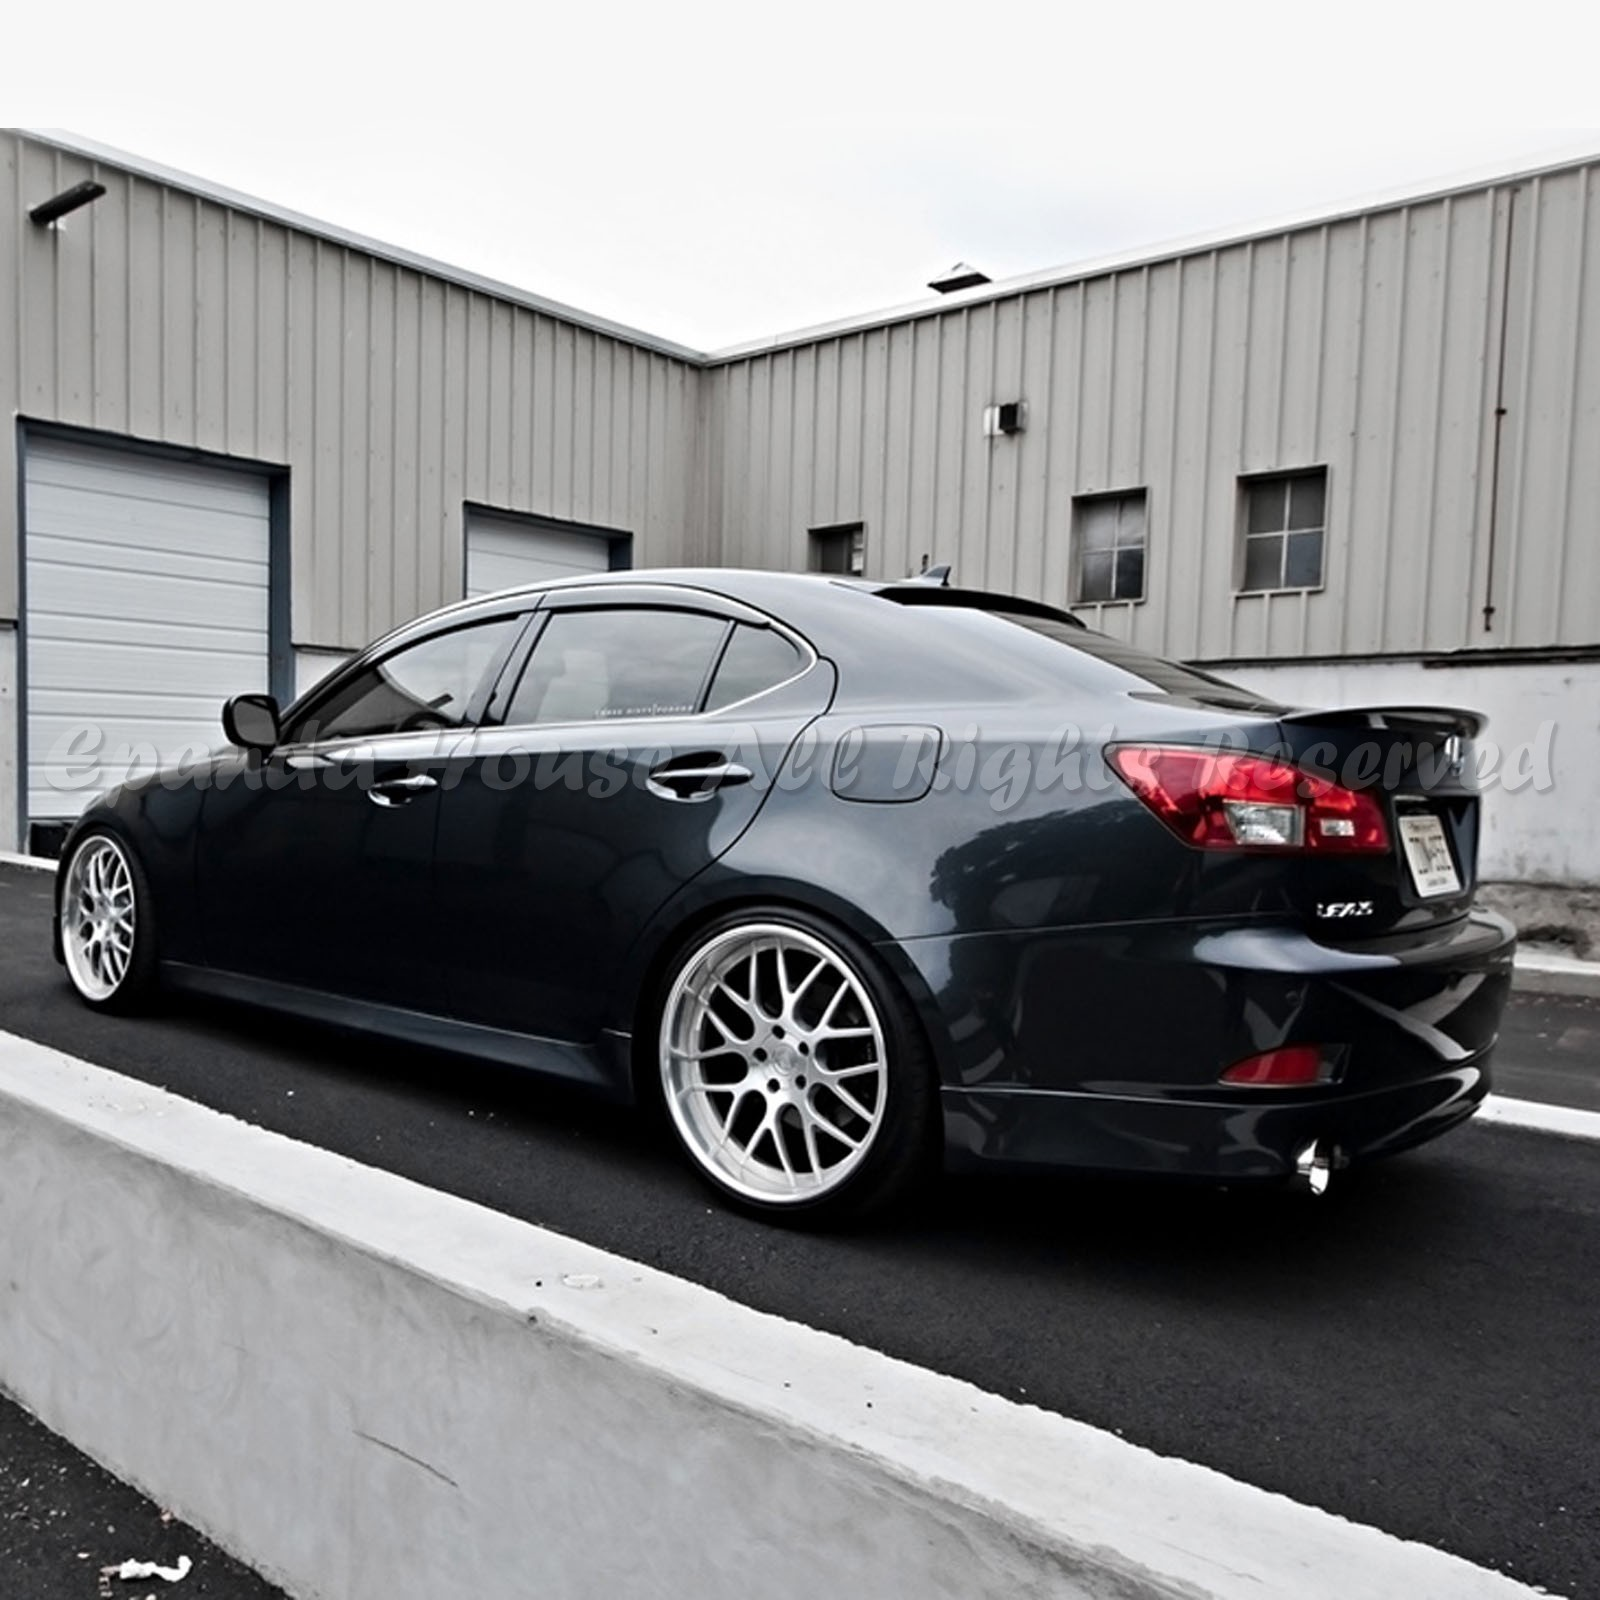 For Sale Lexus Is250: FOR 05-13 LEXUS IS250/350 USA WINDOW WIND DEFLECTOR RAIN